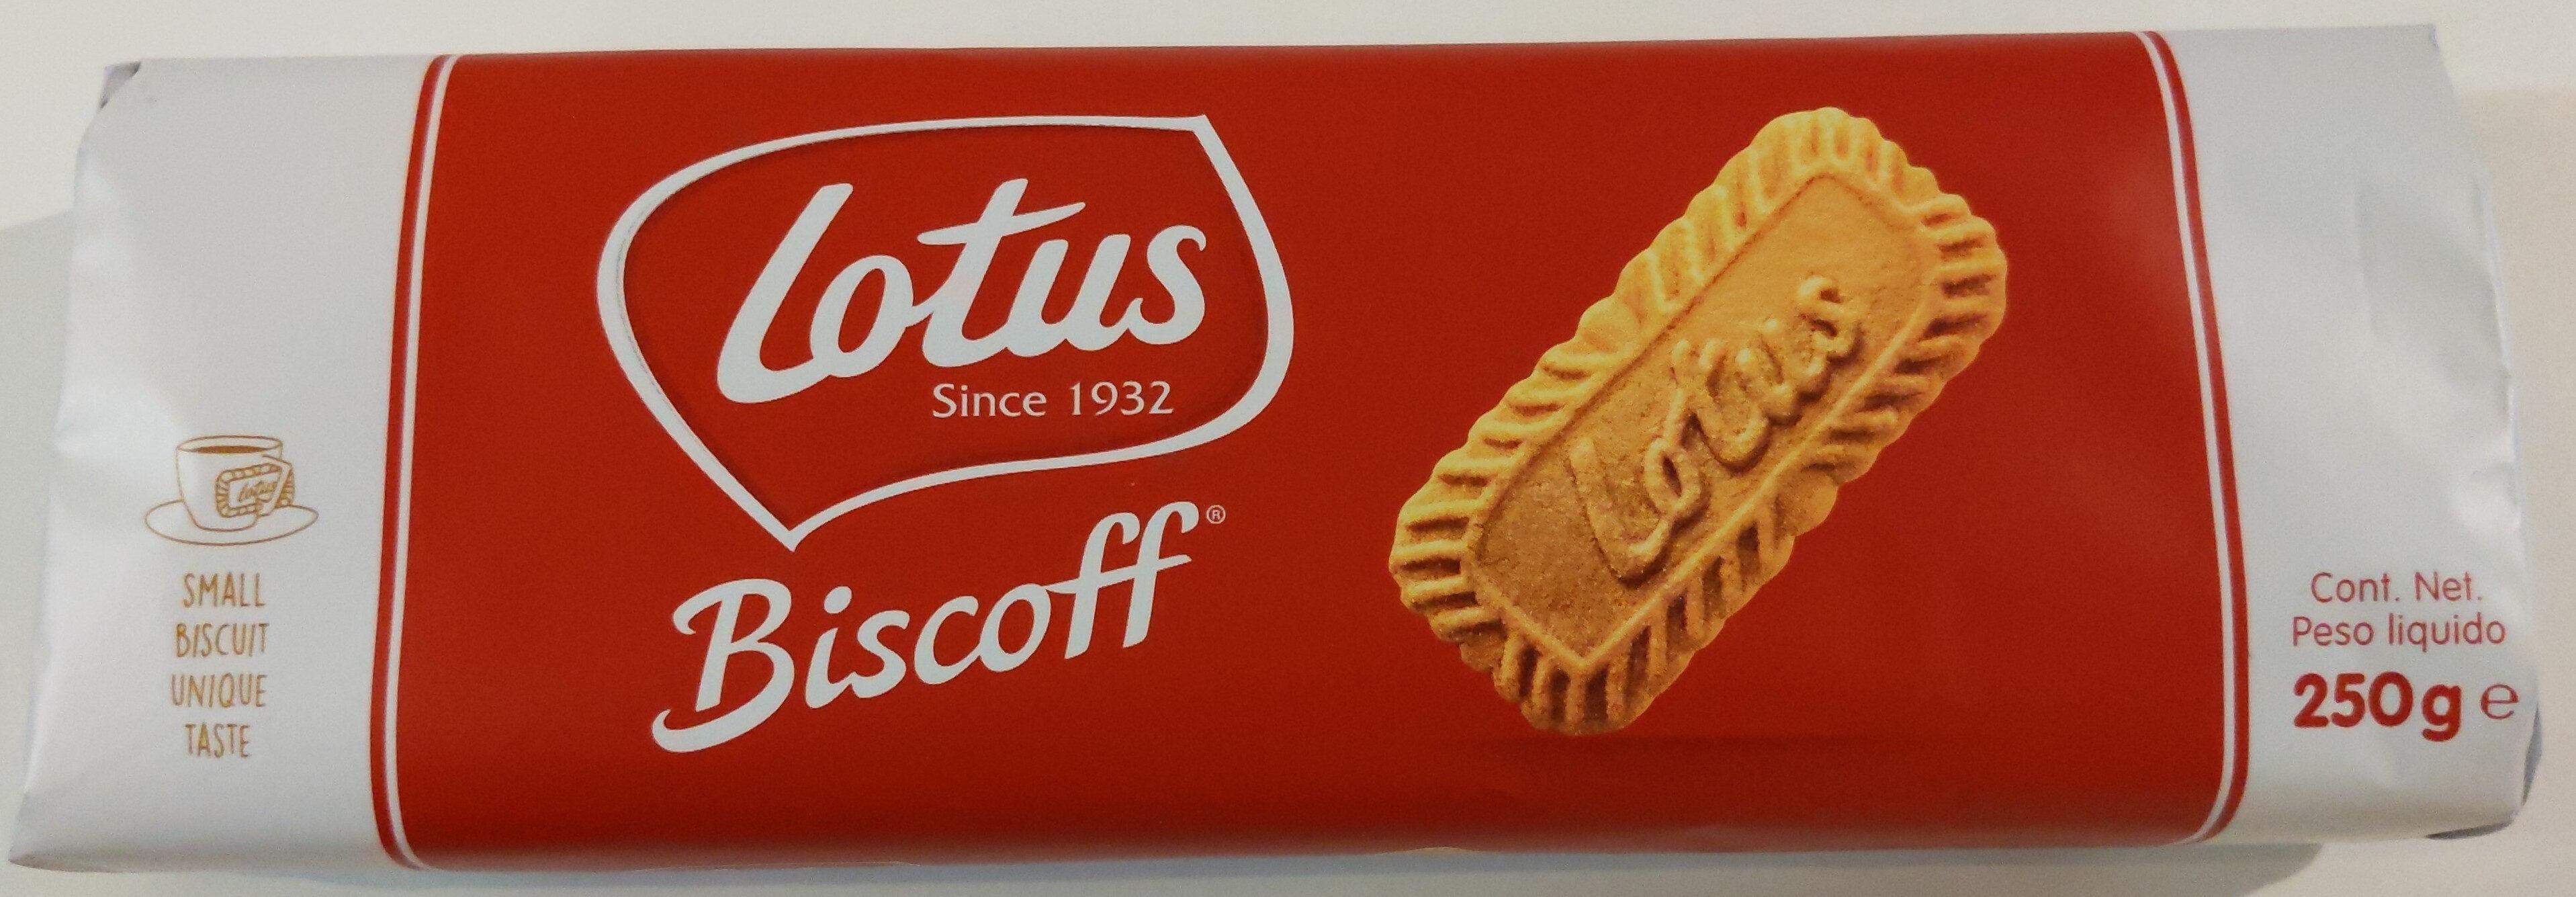 Biscoff - نتاج - es